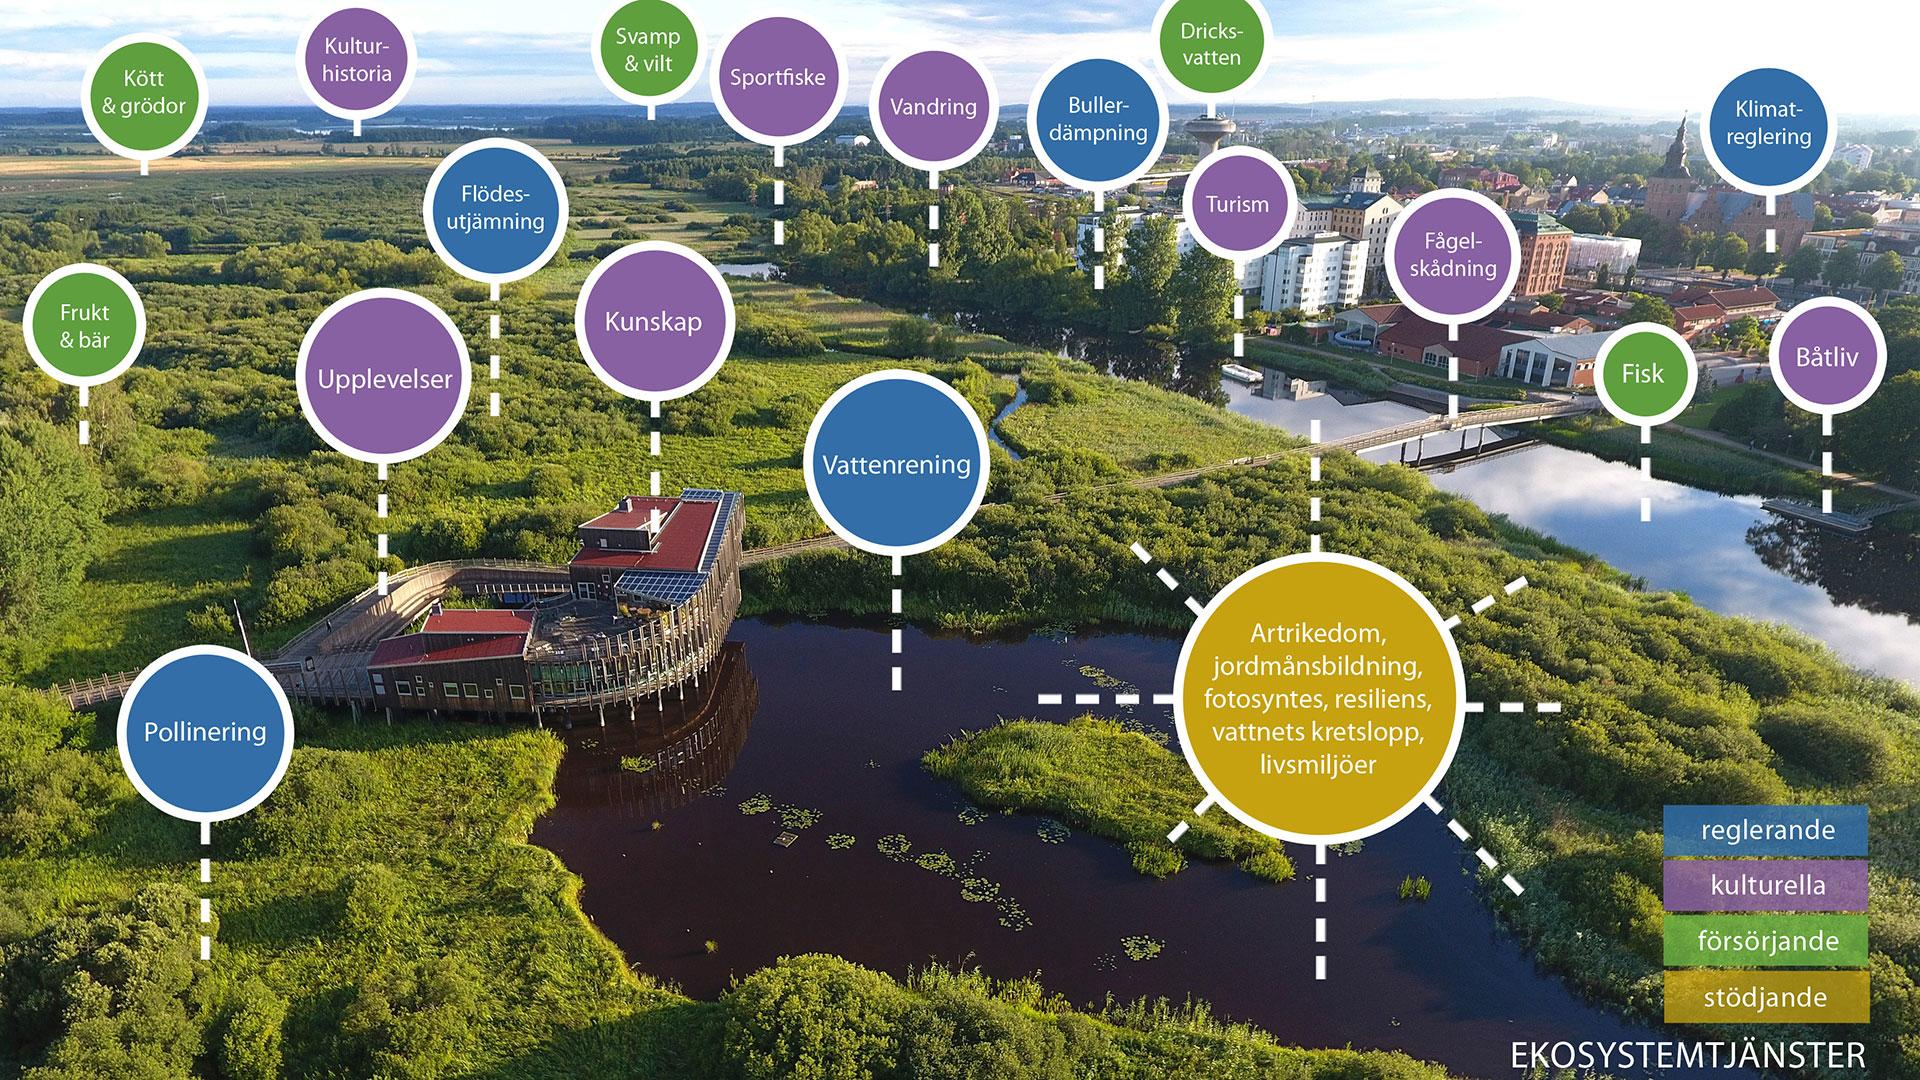 Ekosystemtjänster i Vattenriket